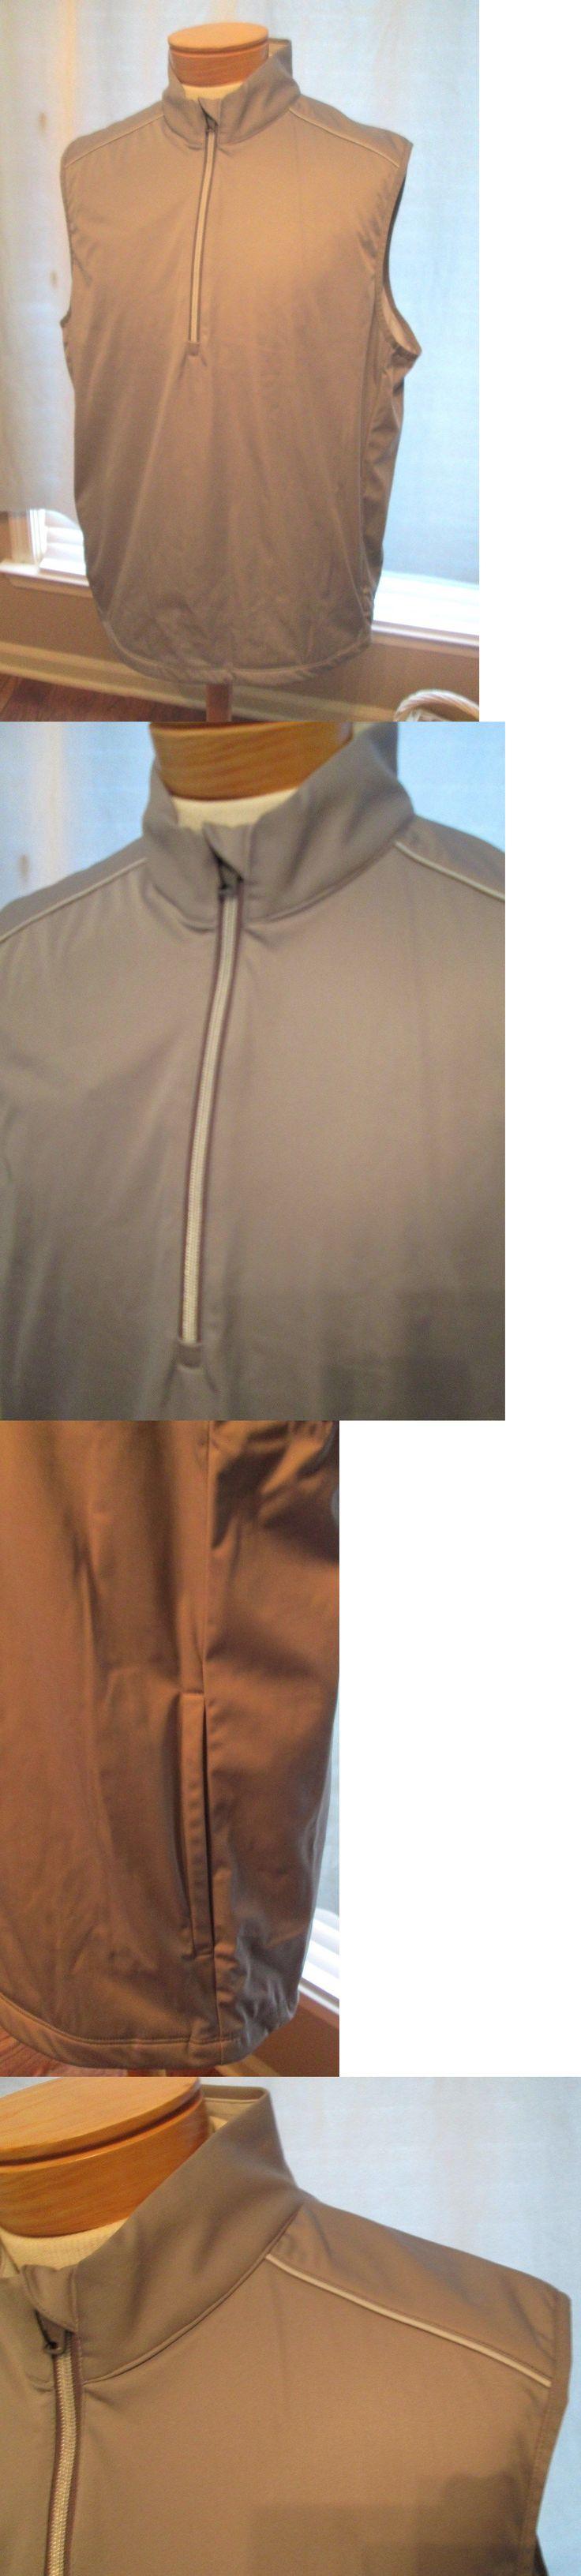 Athletic Vests 181132: Greg Norman Men S Quarter Zip Golf Vest, Gray, Xl, Nwt -> BUY IT NOW ONLY: $45.5 on eBay!